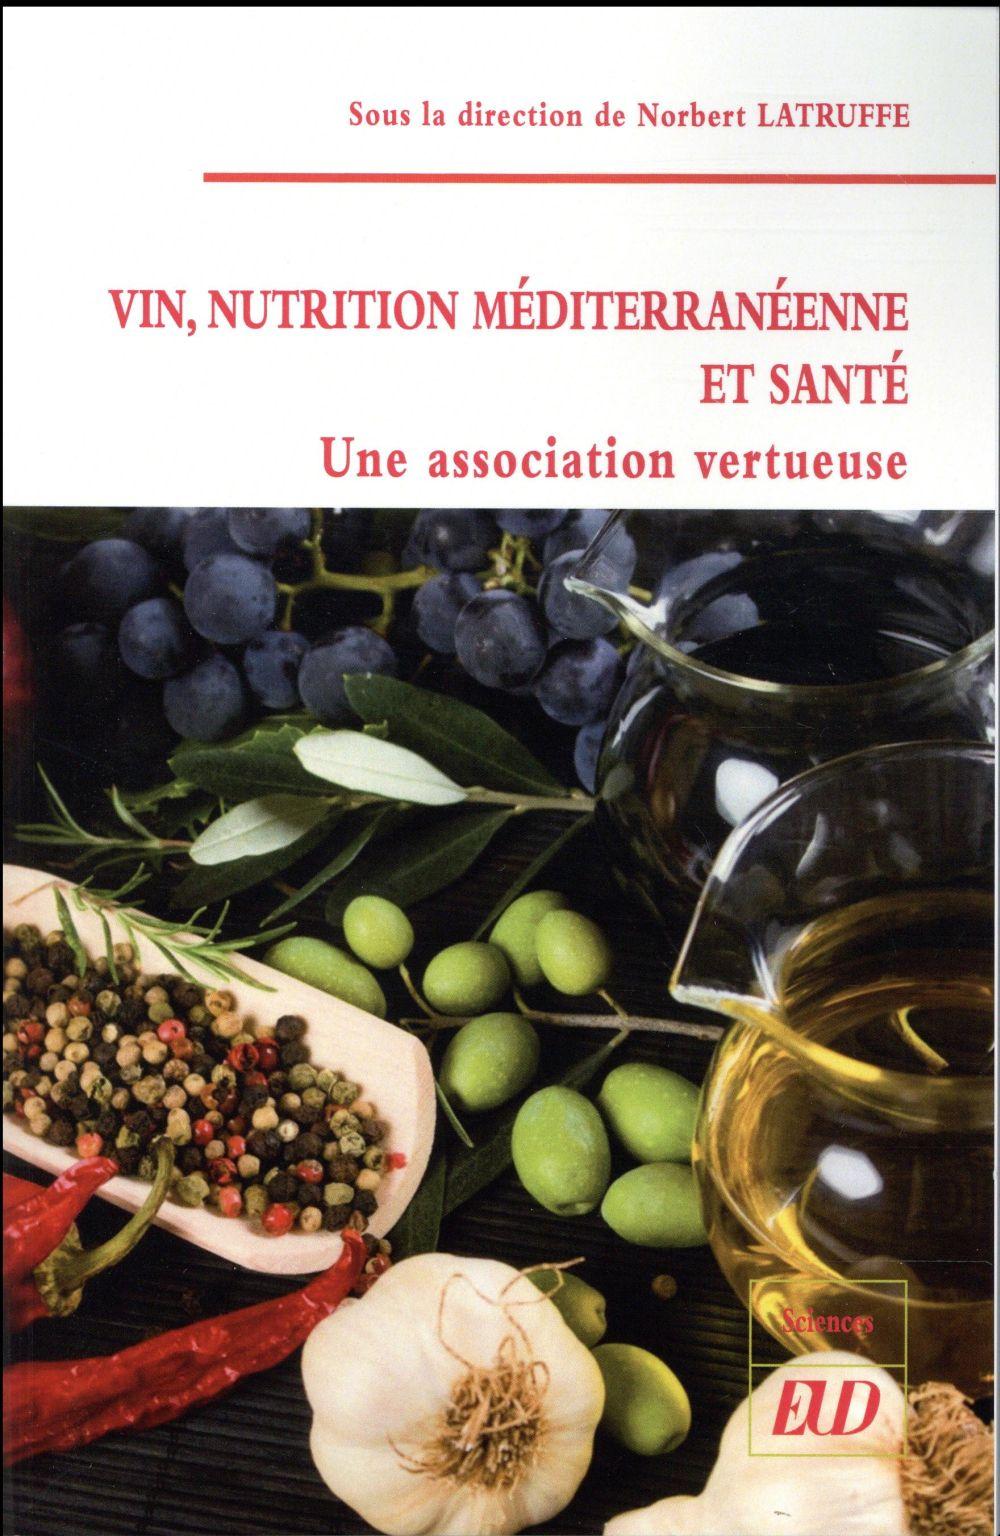 Vin, nutrition mediterraneenne et sante - une association fructueuse